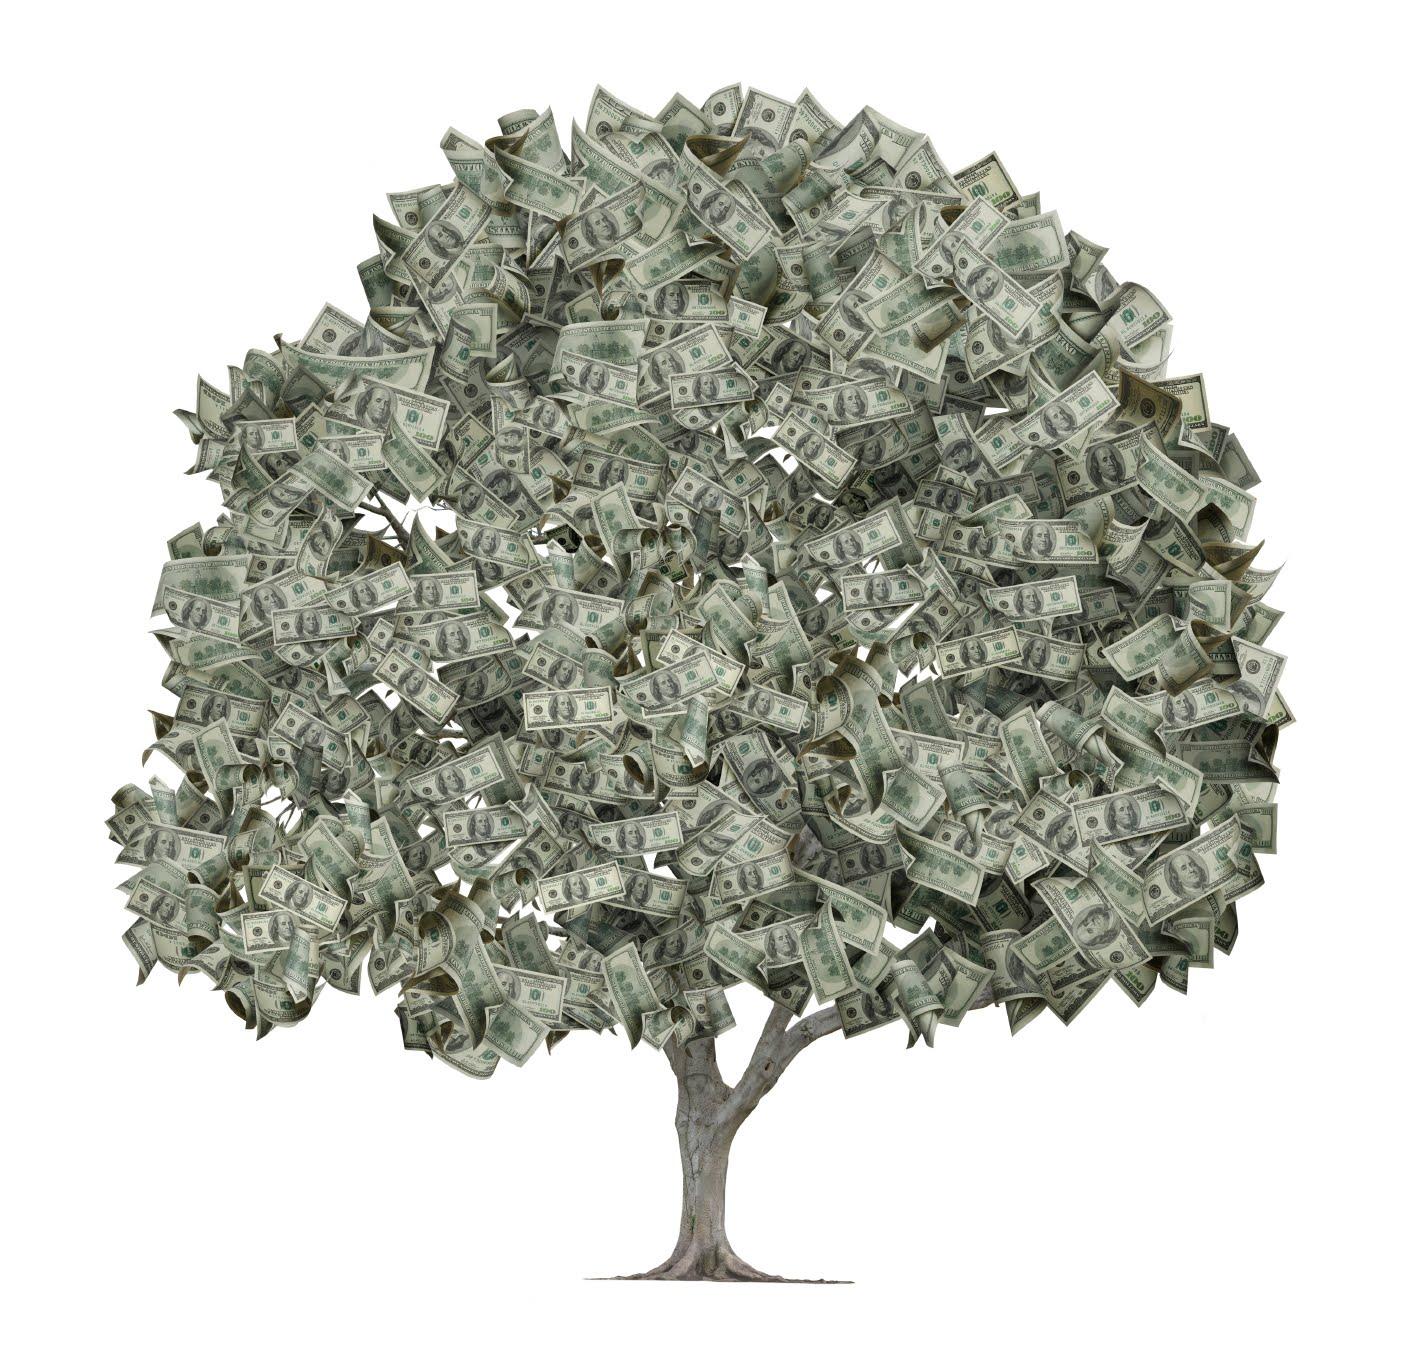 http://4.bp.blogspot.com/-VrKGuN_pMOY/TjPql78UI9I/AAAAAAAAATg/rcI3edZvYr8/s1600/iStock_money+tree.jpg